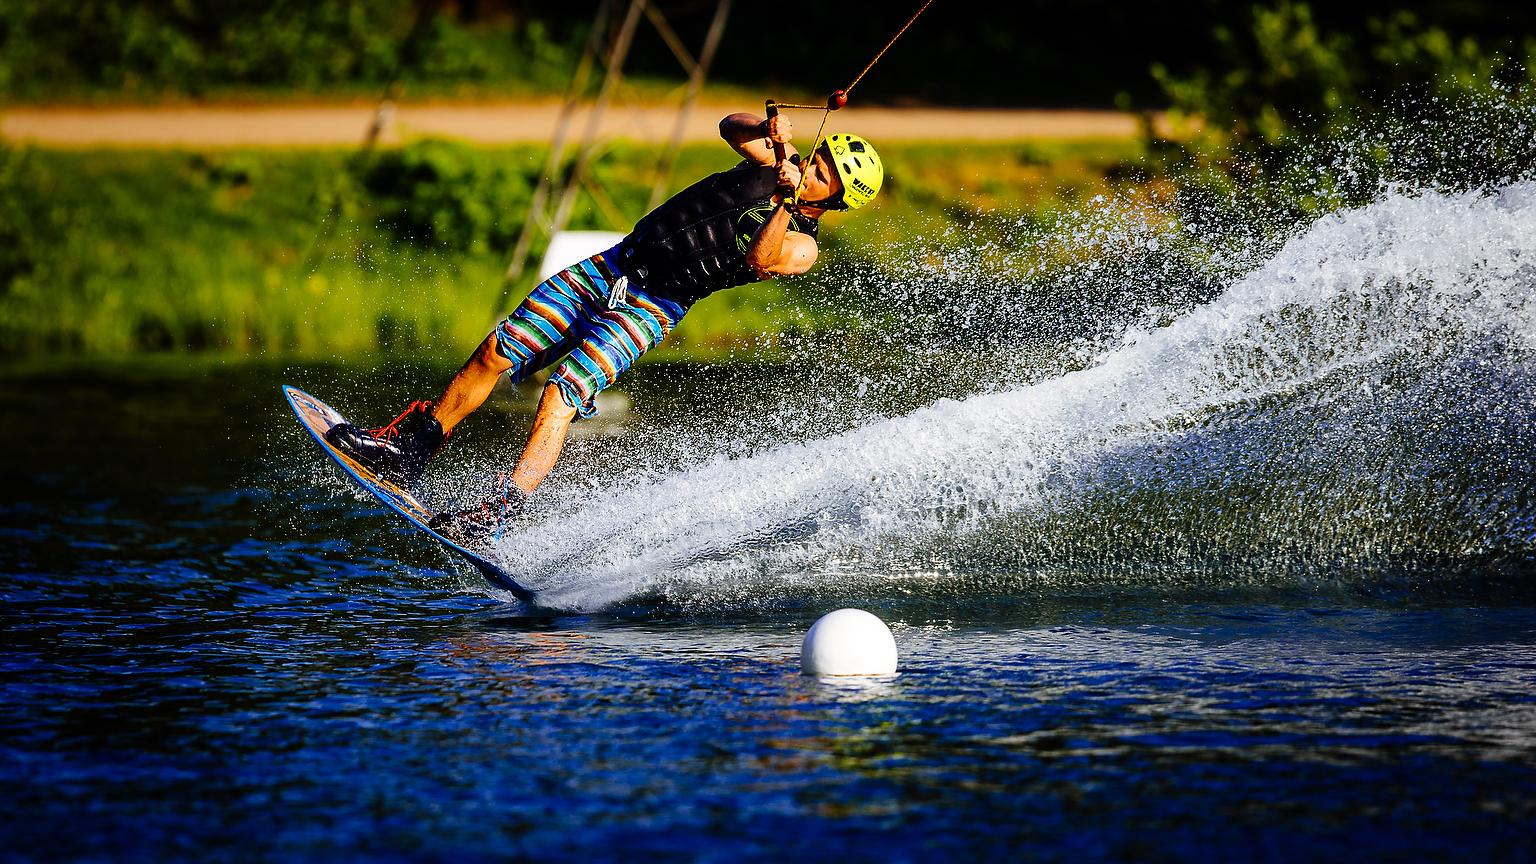 Sportfotograf-Actionfotografie-Wakeboard-Shooting-Actionsports